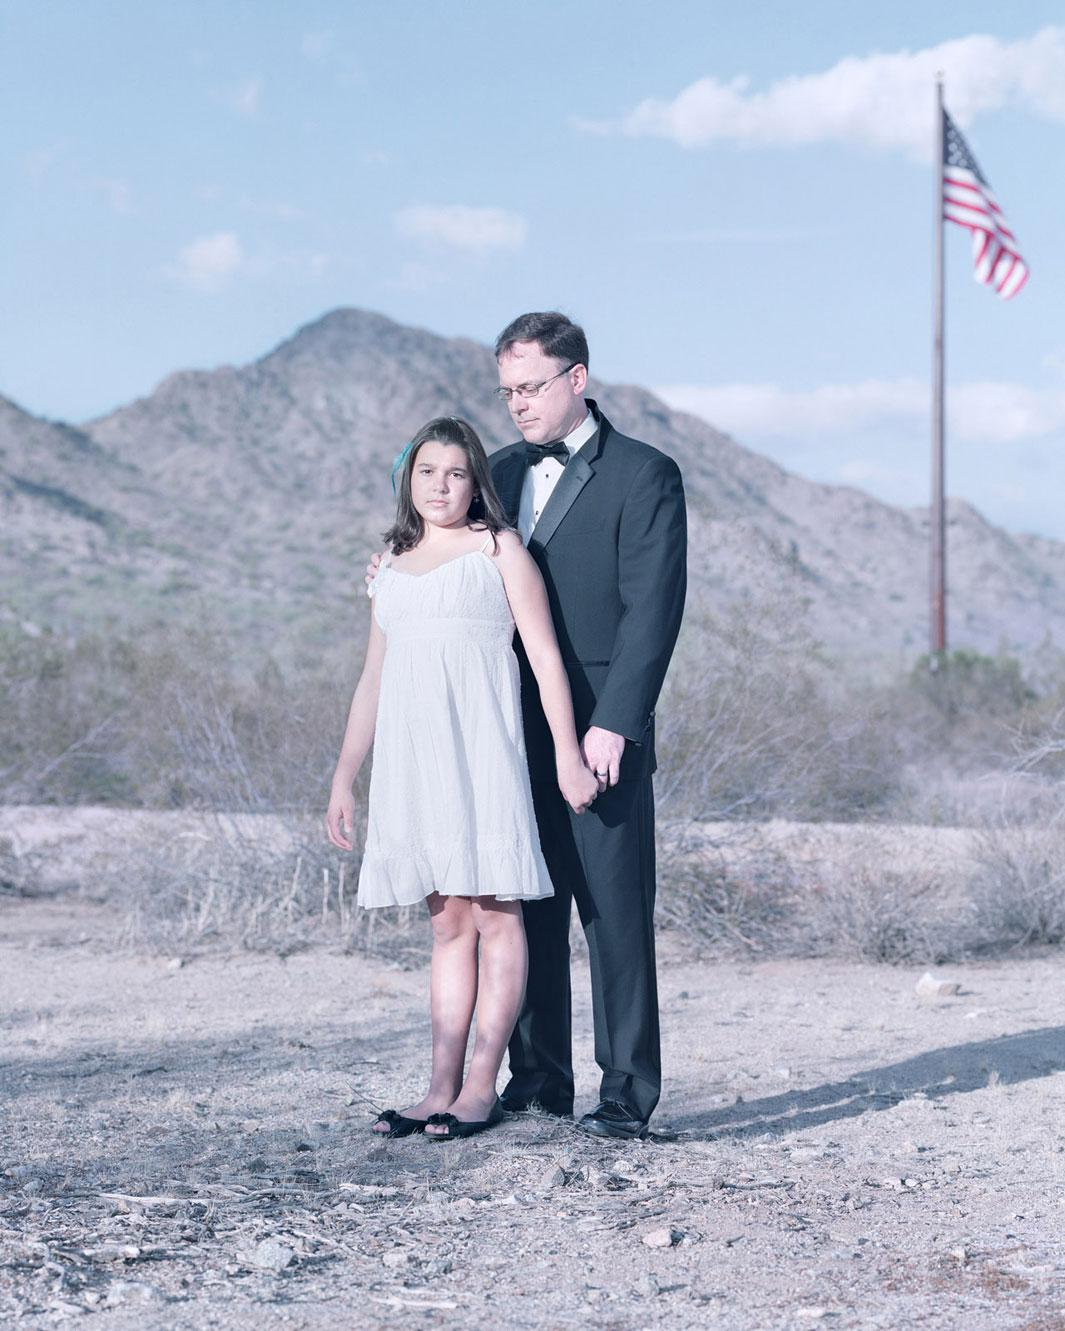 Jenna and Jeff Clark, Chandler, Arizona.